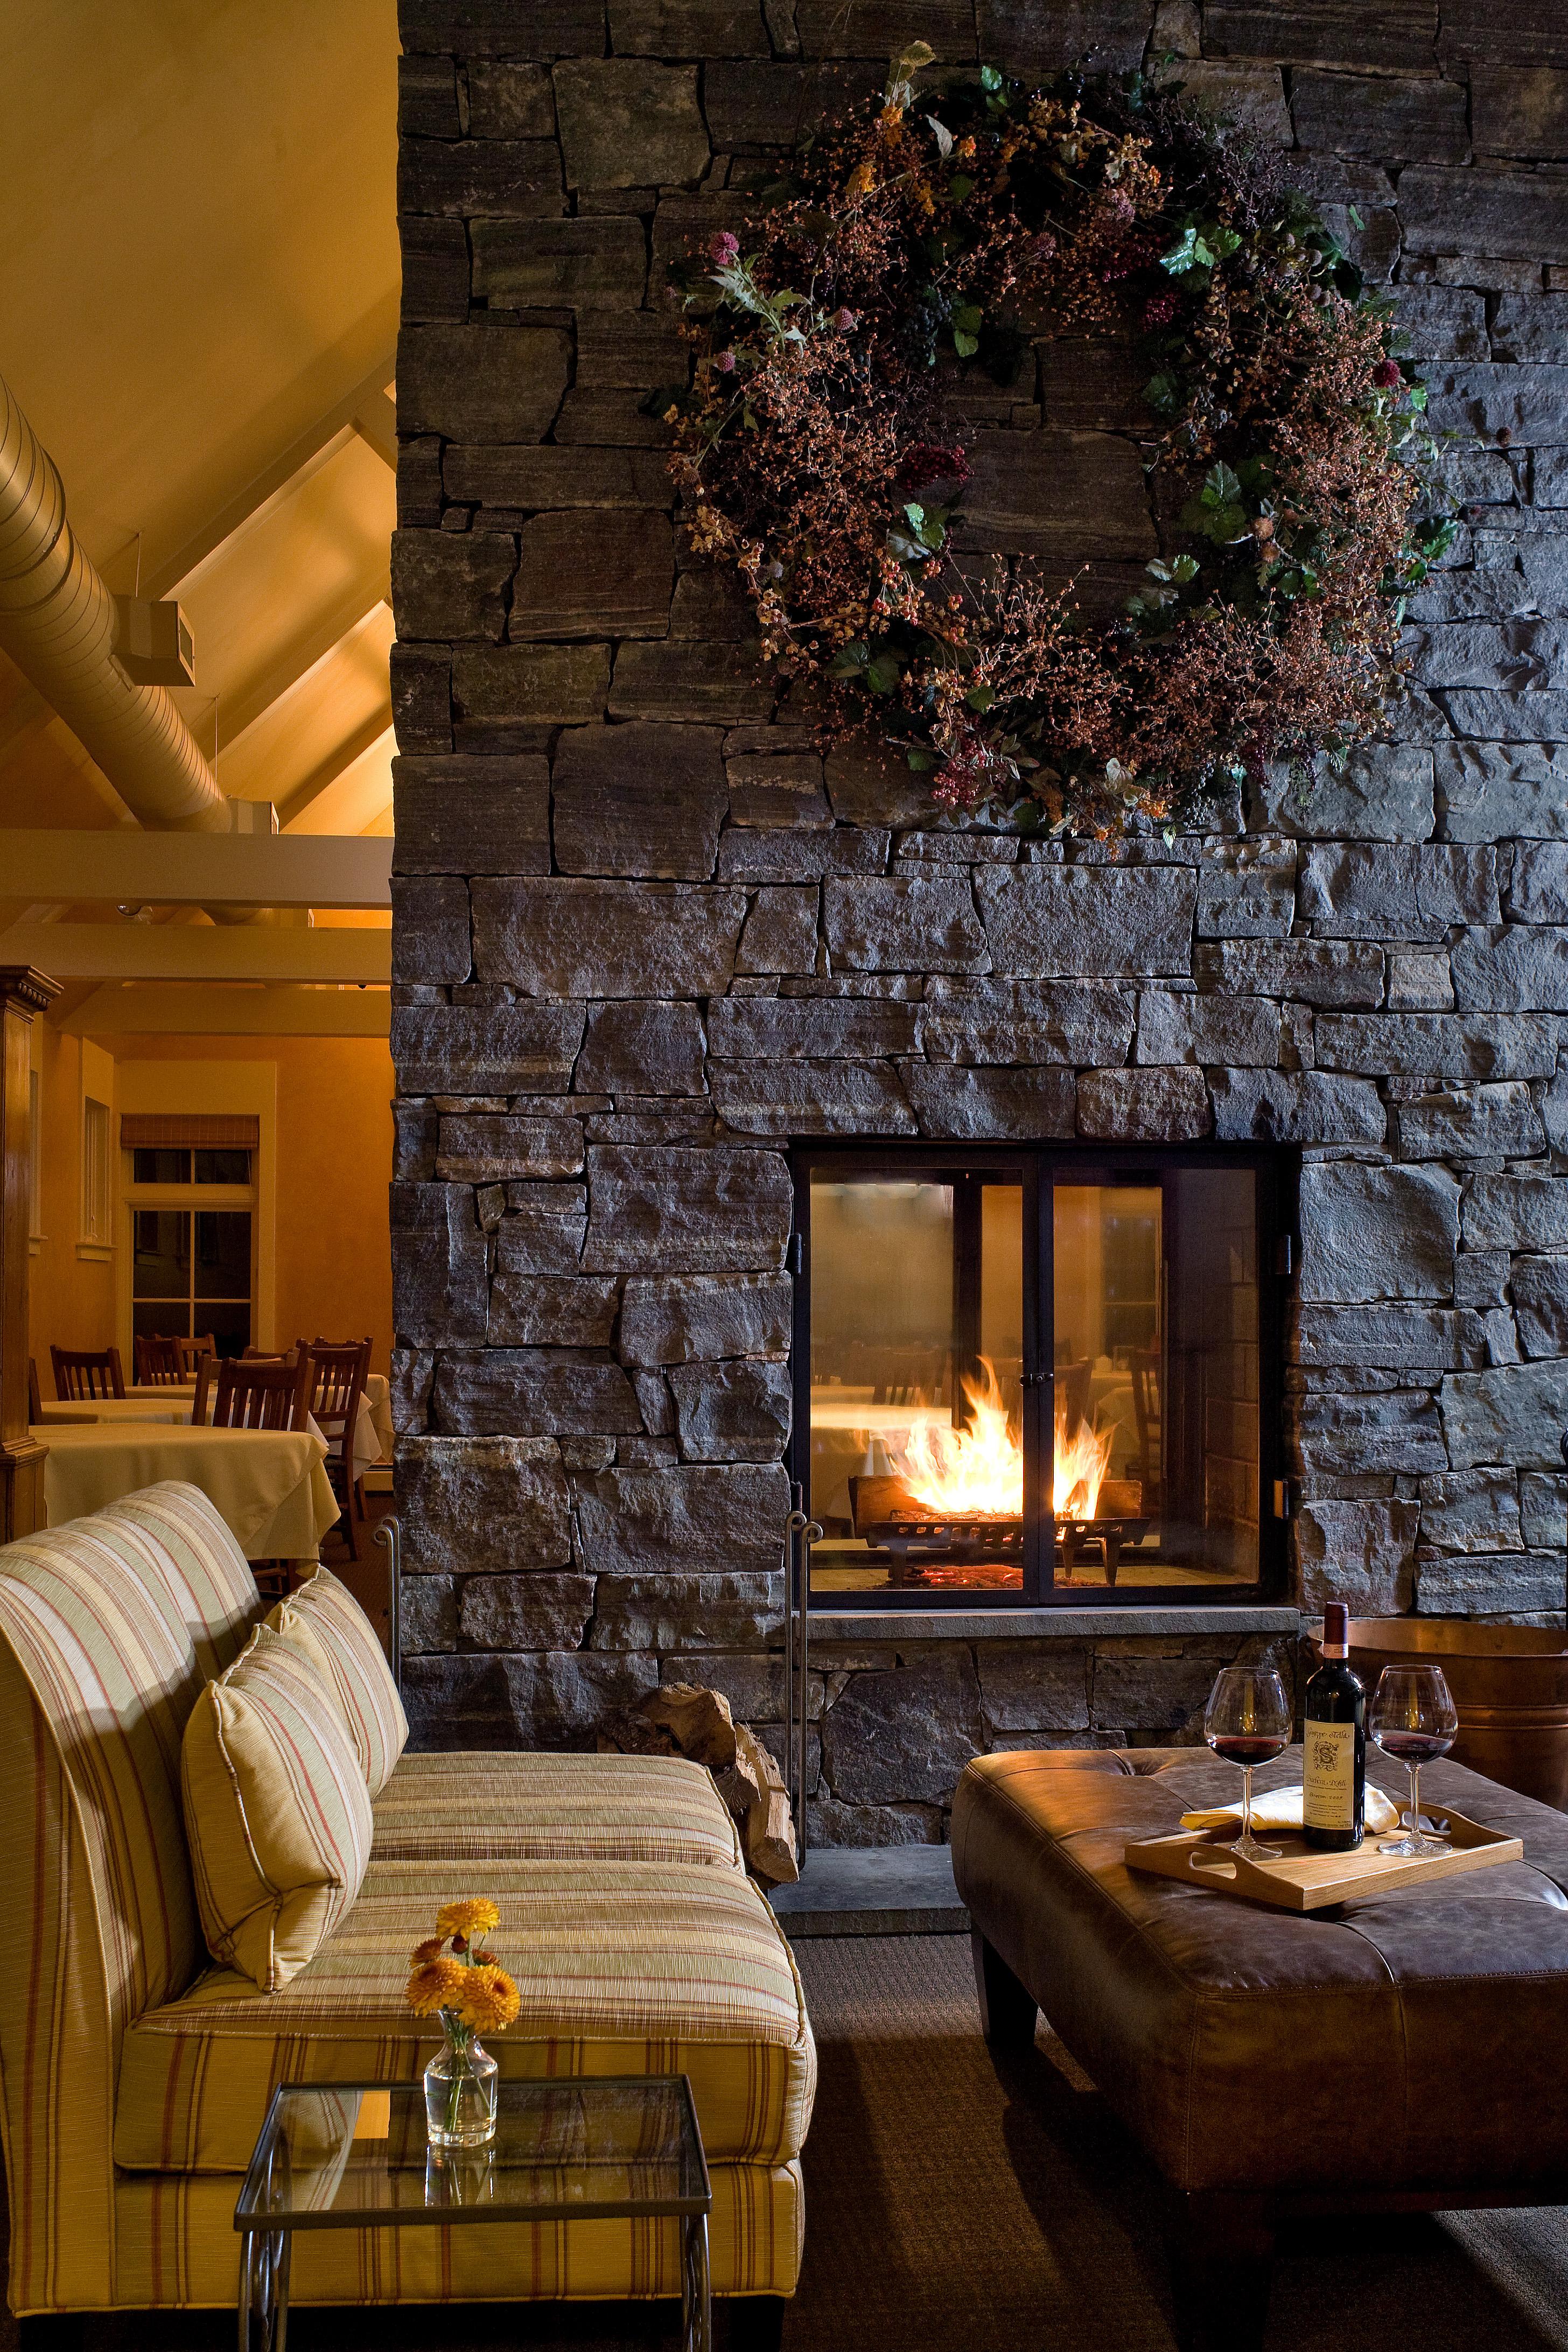 Fireplace jackson house innjackson house inn for Fireplace in house